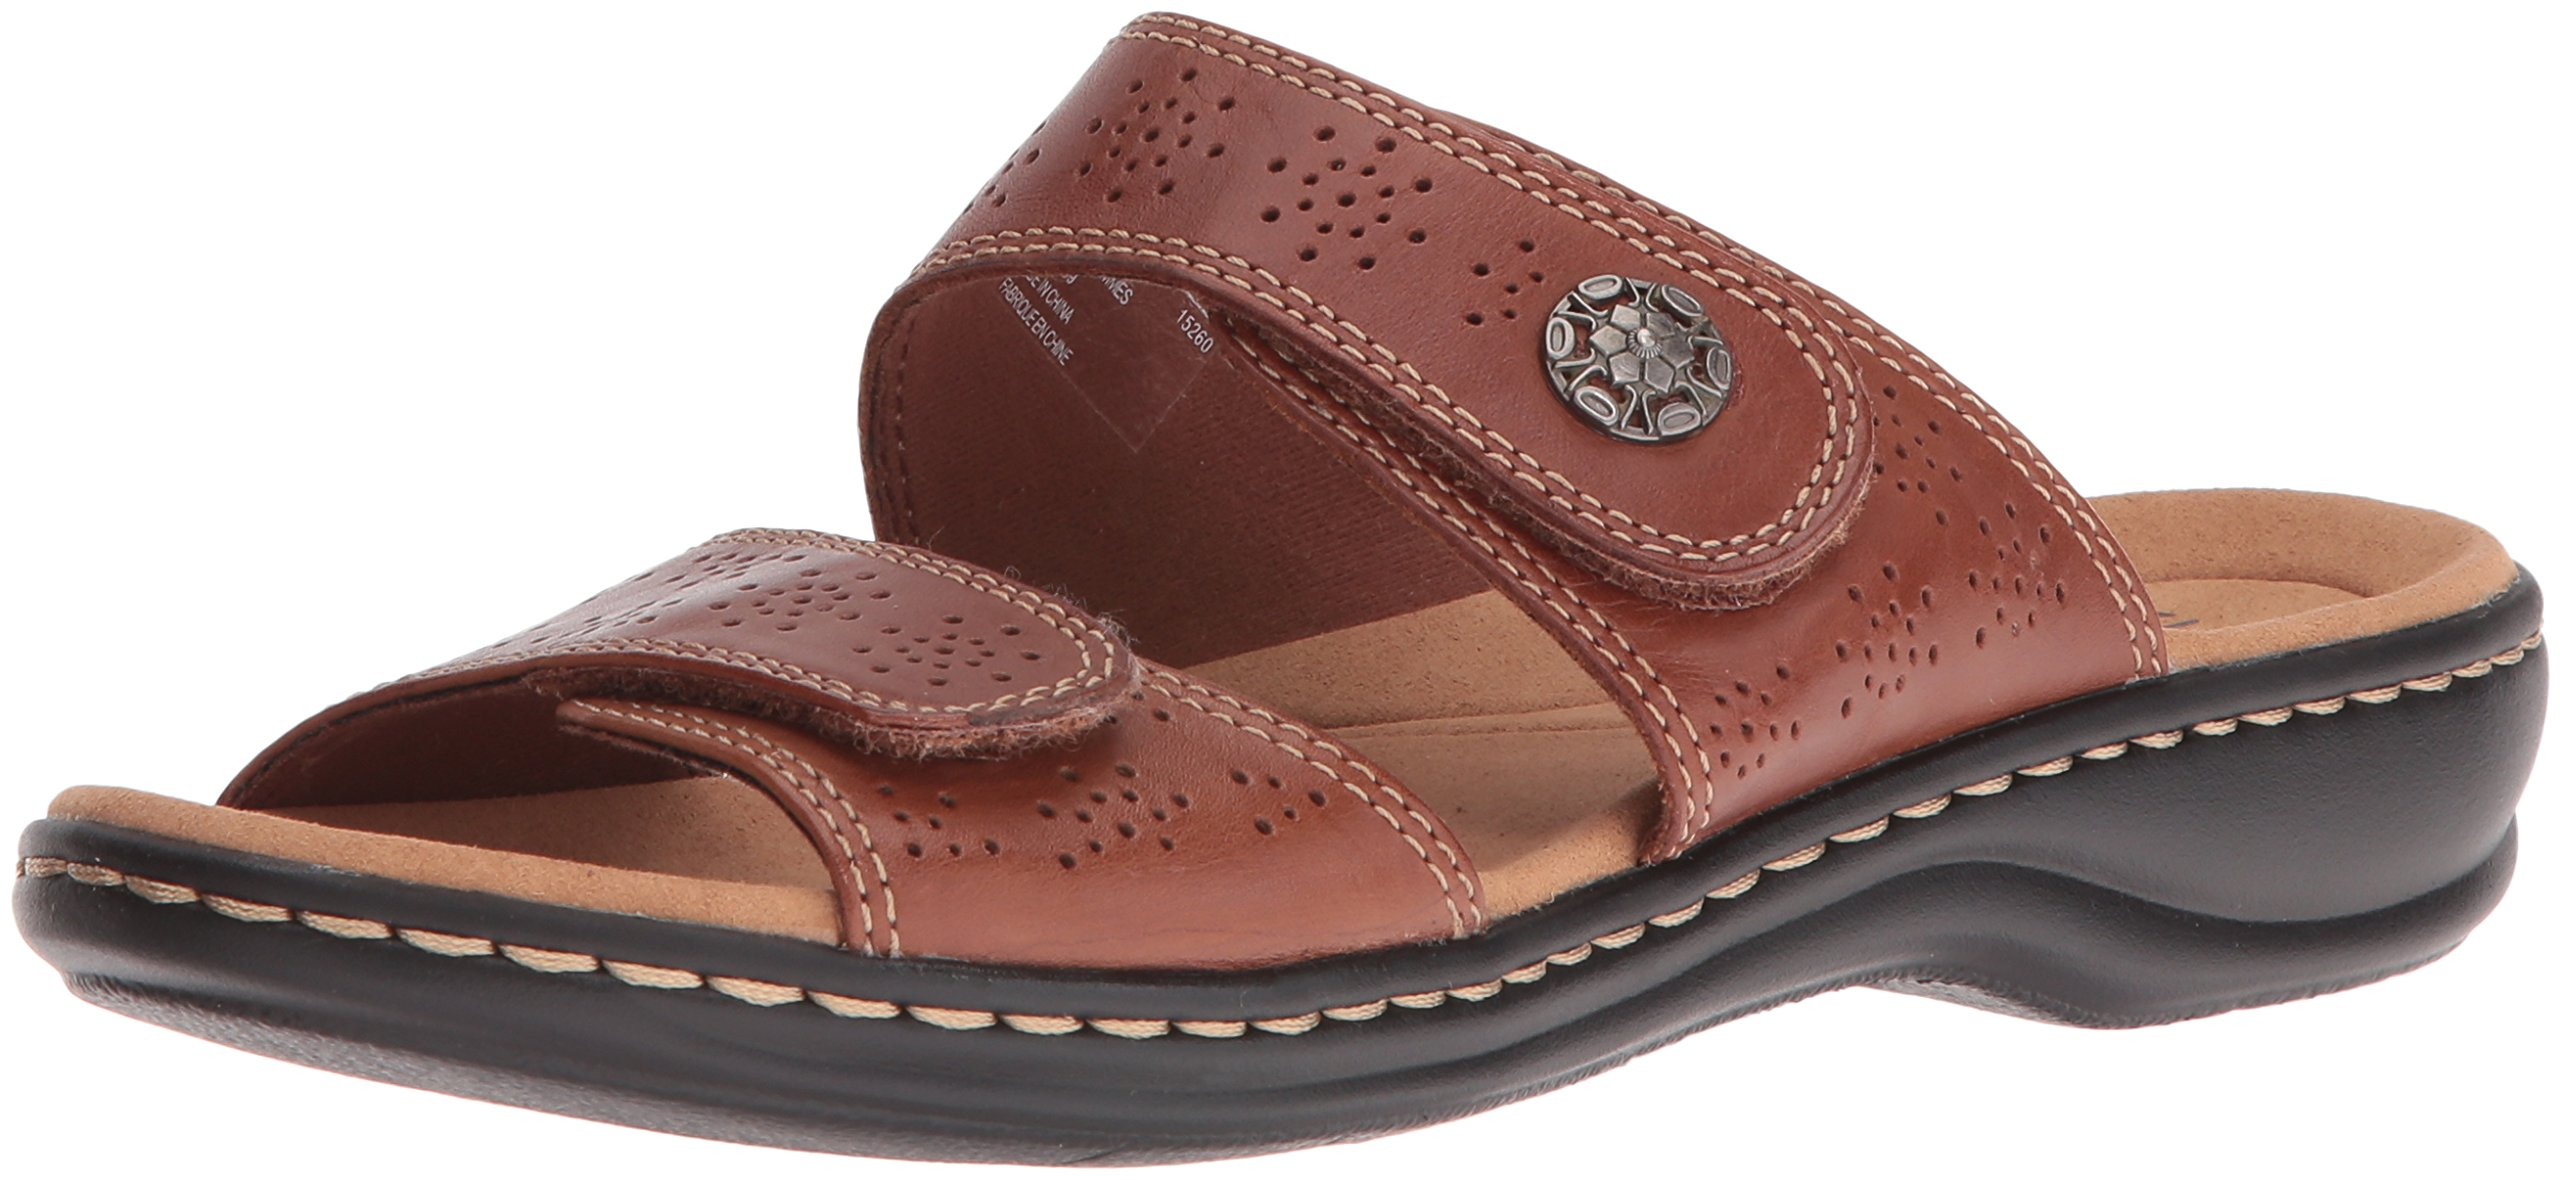 CLARKS Women's Leisa Lacole Slide Sandal, Tan Leather, 8 M US